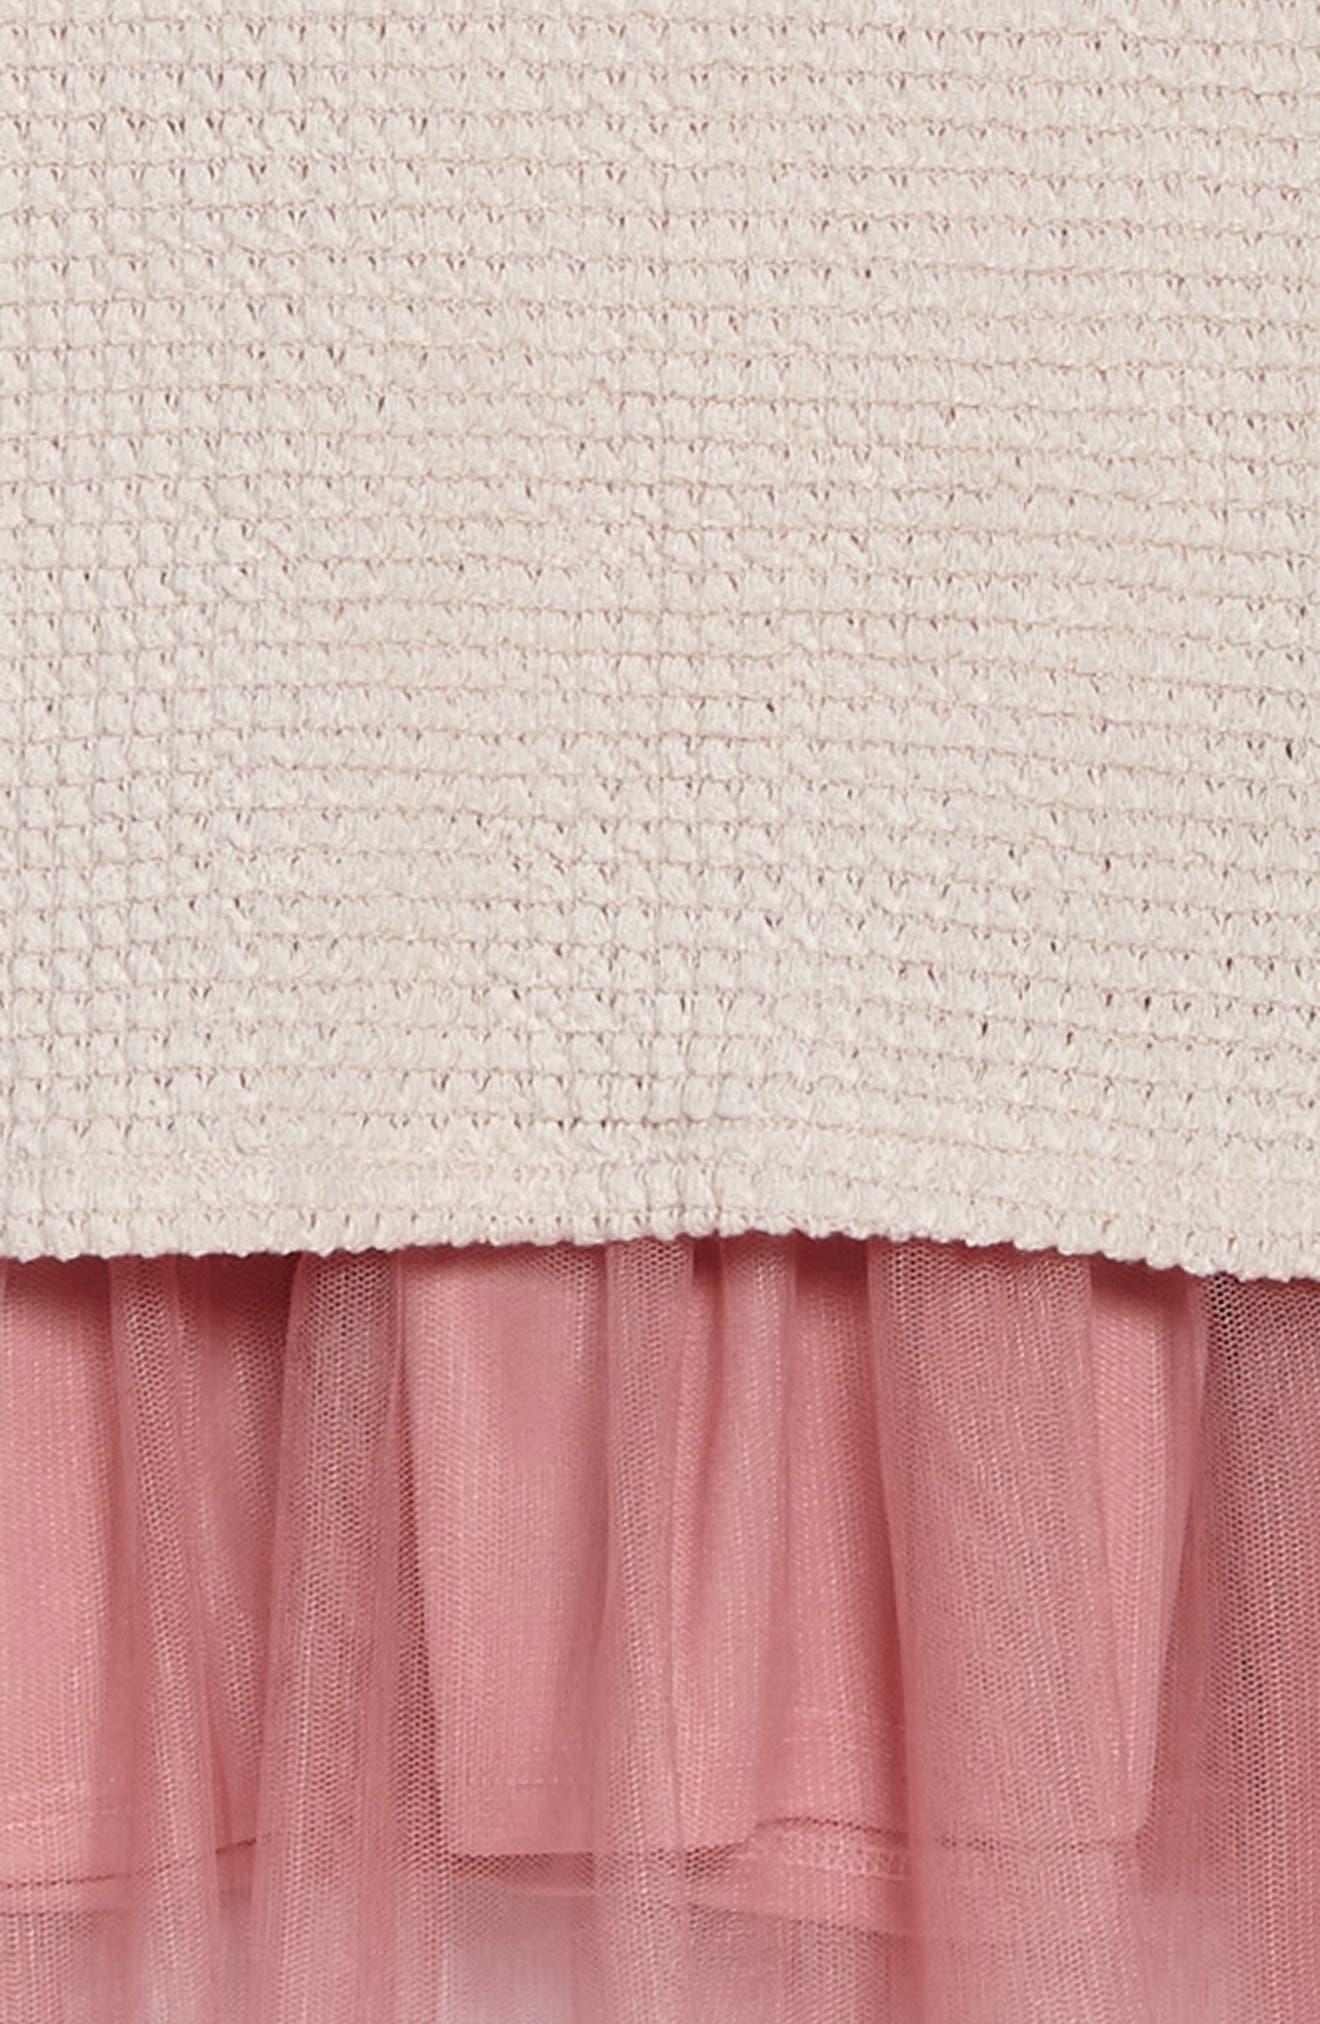 Sweater Knit Tulle Dress,                             Alternate thumbnail 3, color,